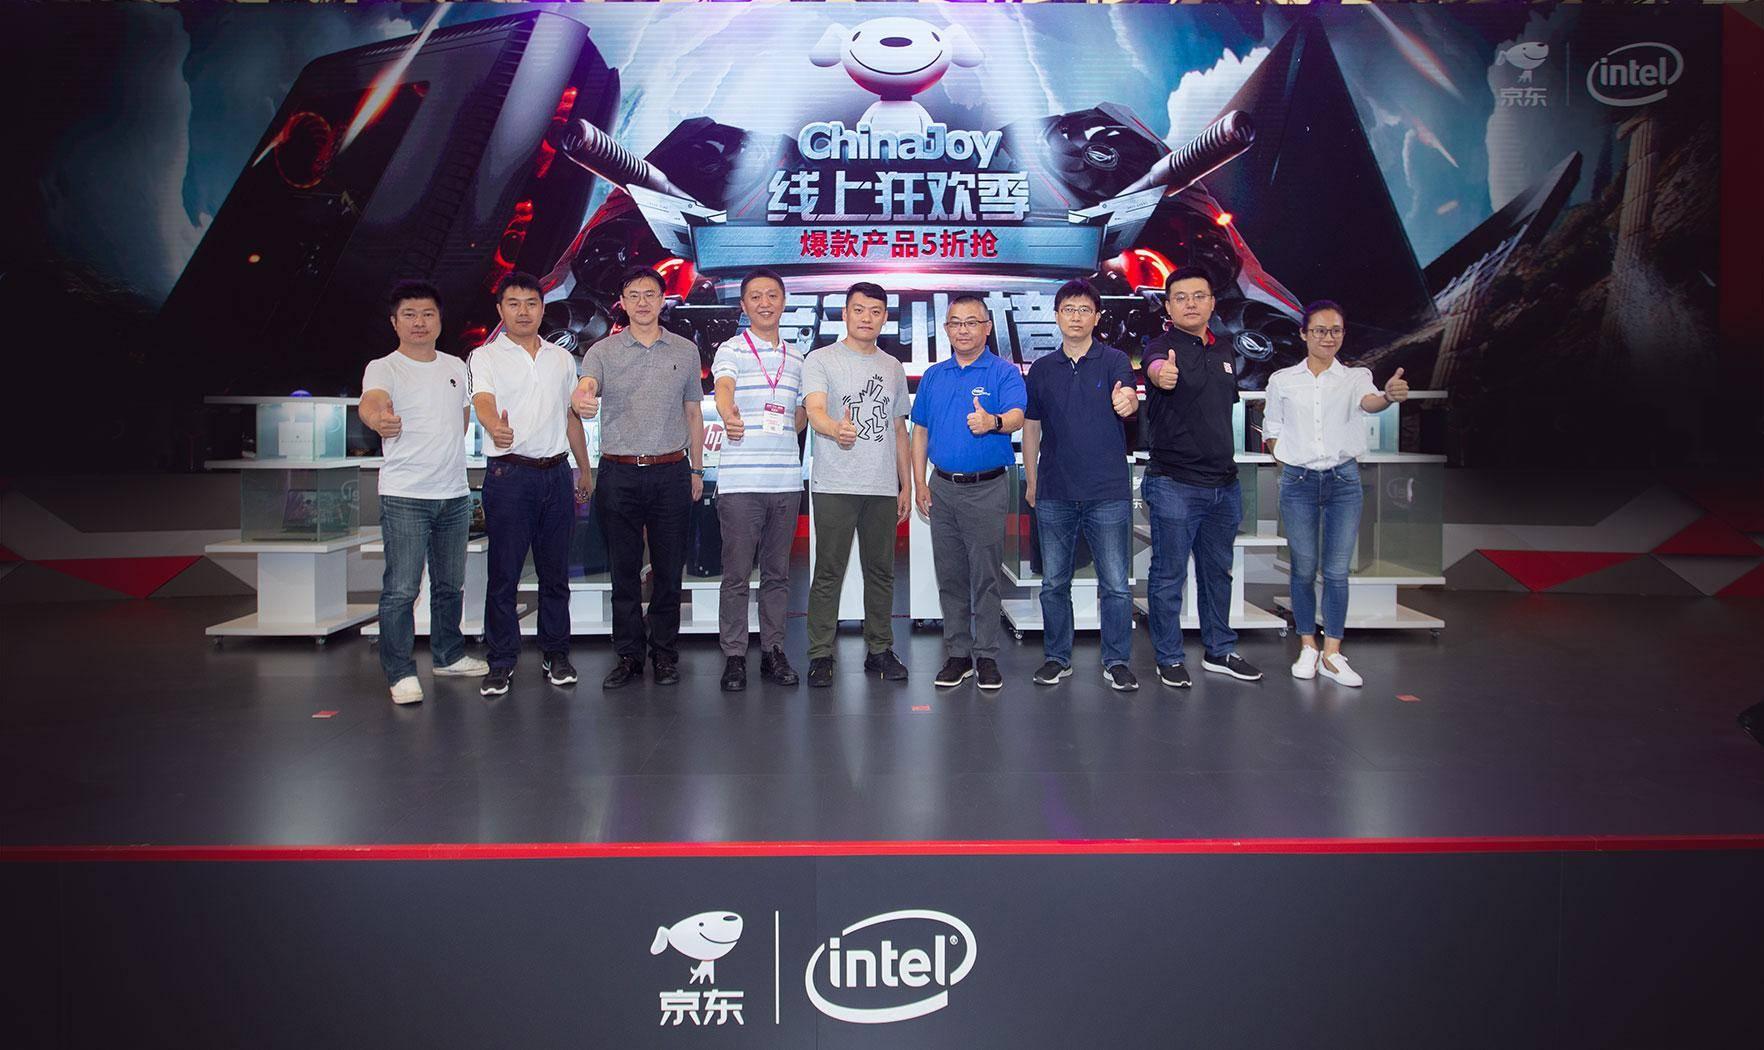 ChinaJoy现场京东携英特尔、联想、惠普、戴尔等品牌掀起电竞新品风潮